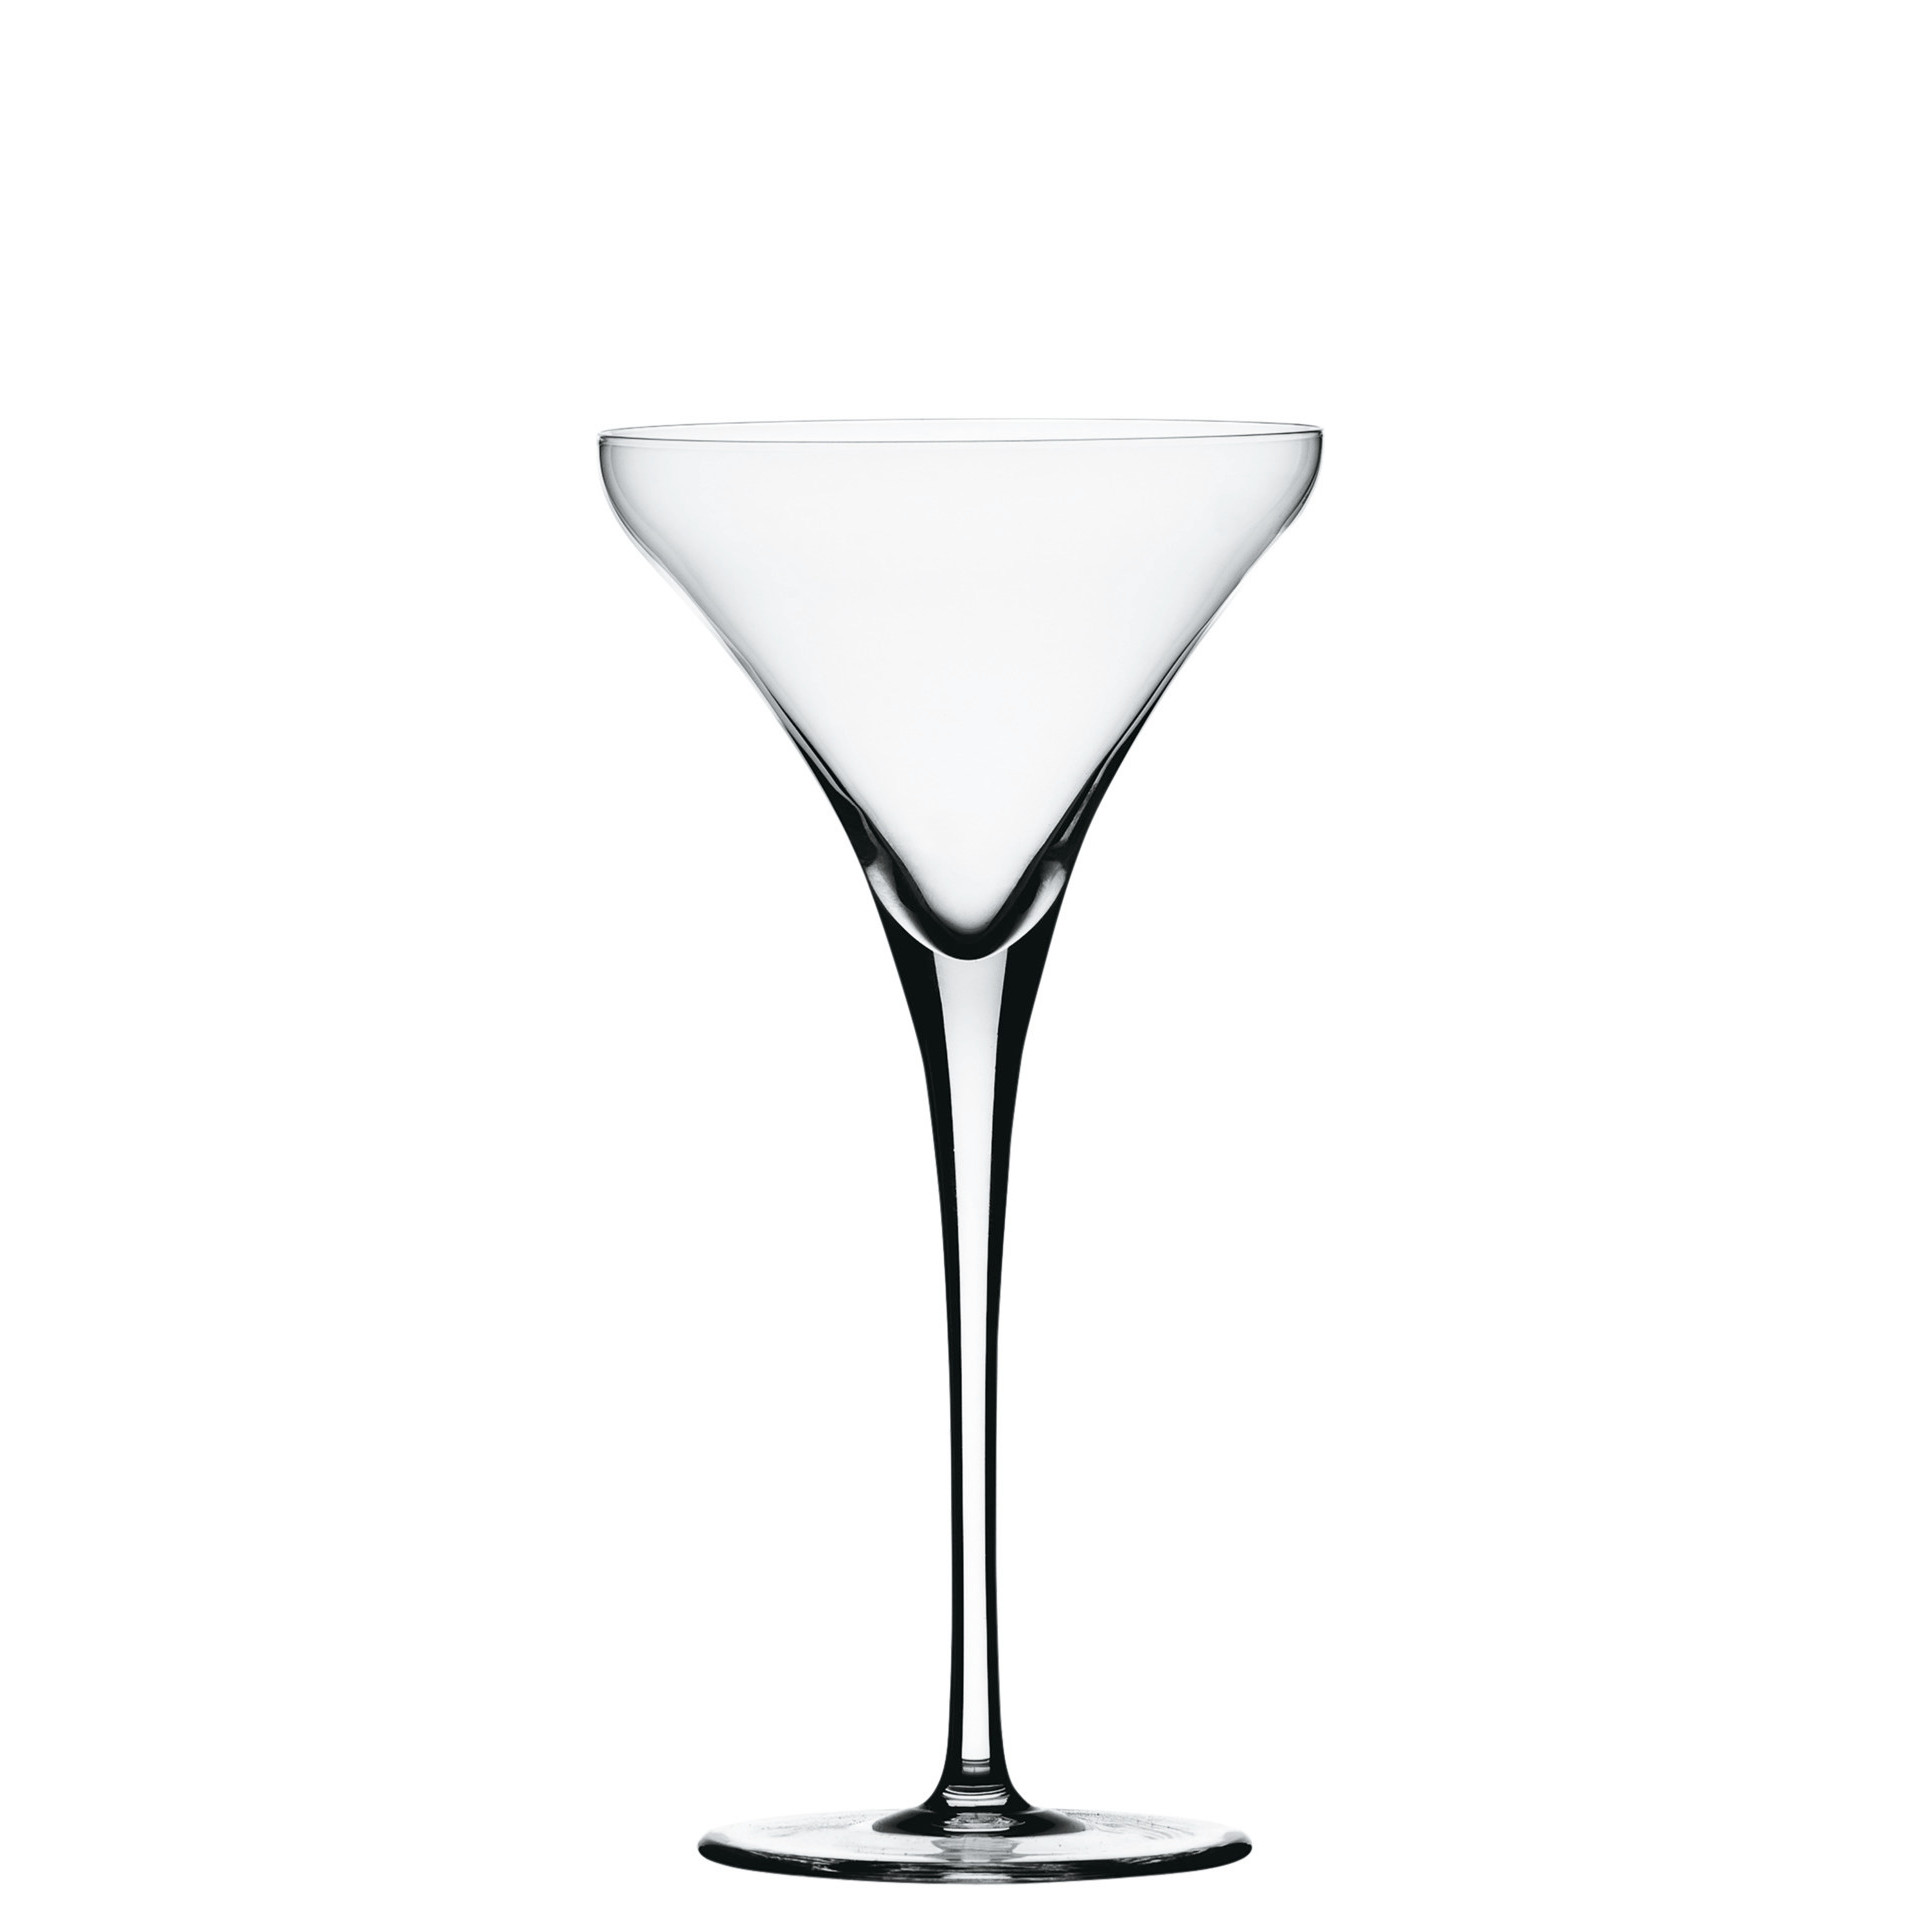 Willsberger Anniversary, Cocktail- / Martiniglas ø 112 mm / 0,26 l